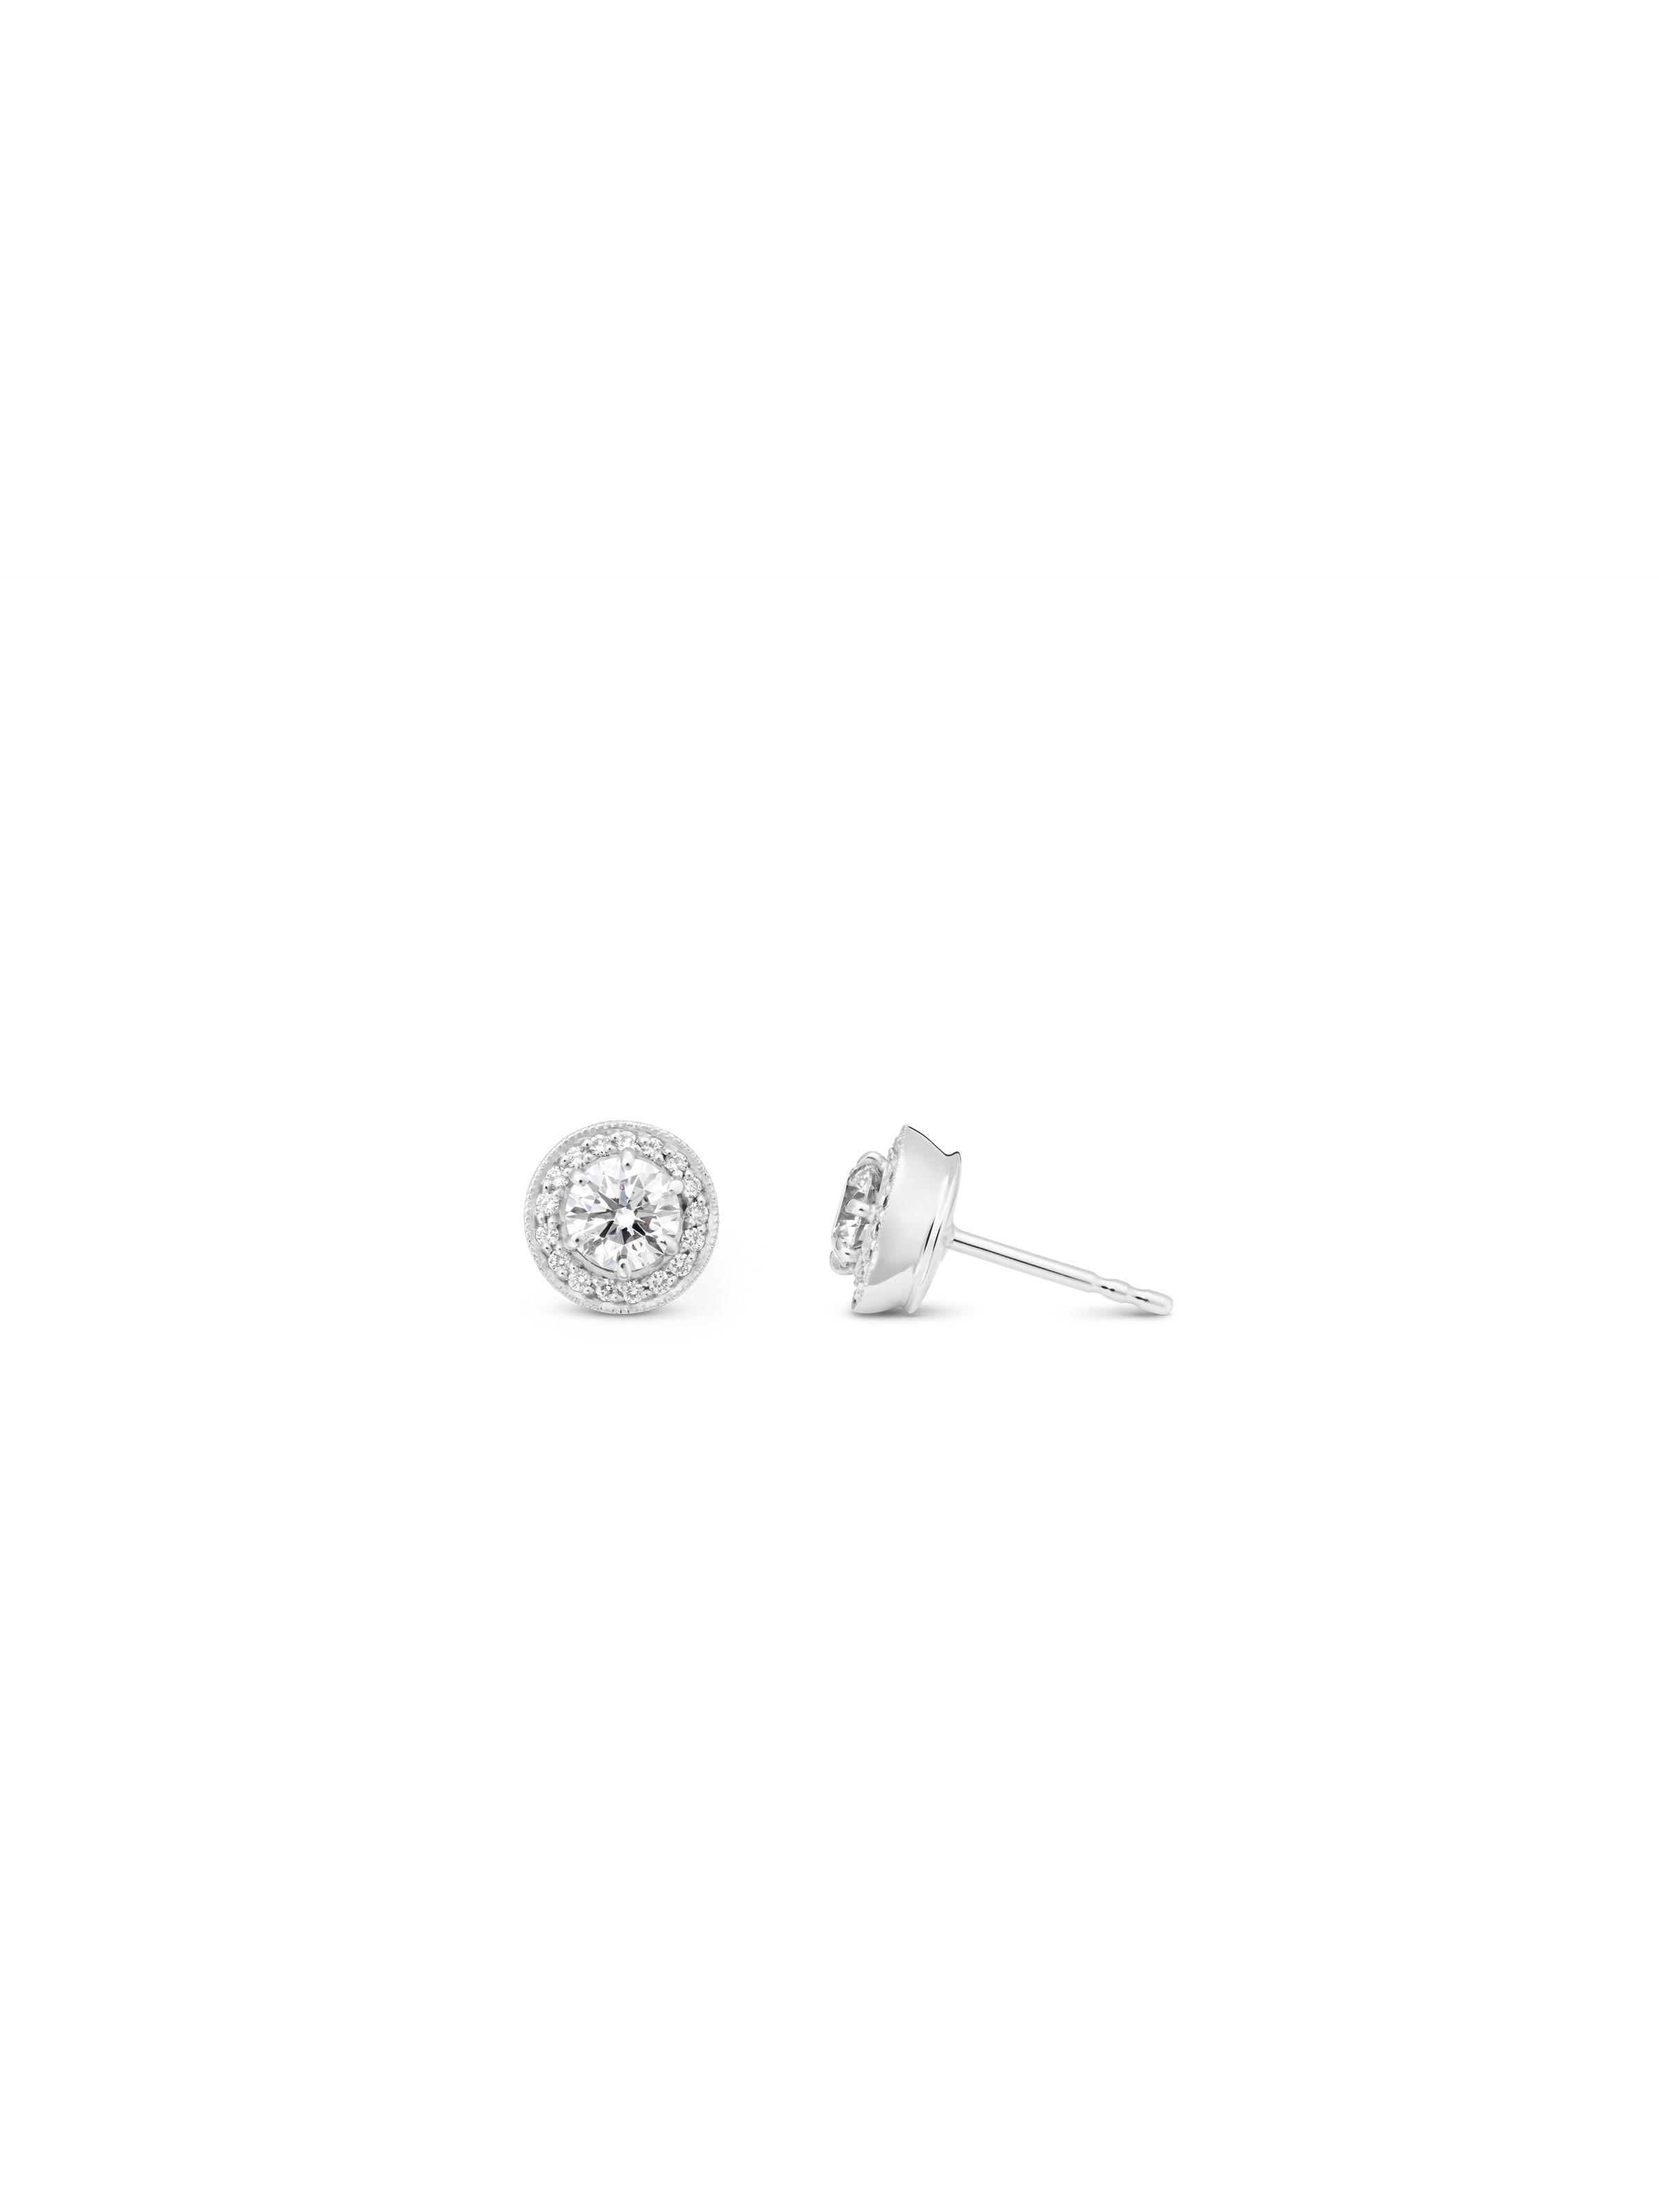 Crown millegrain ear studs